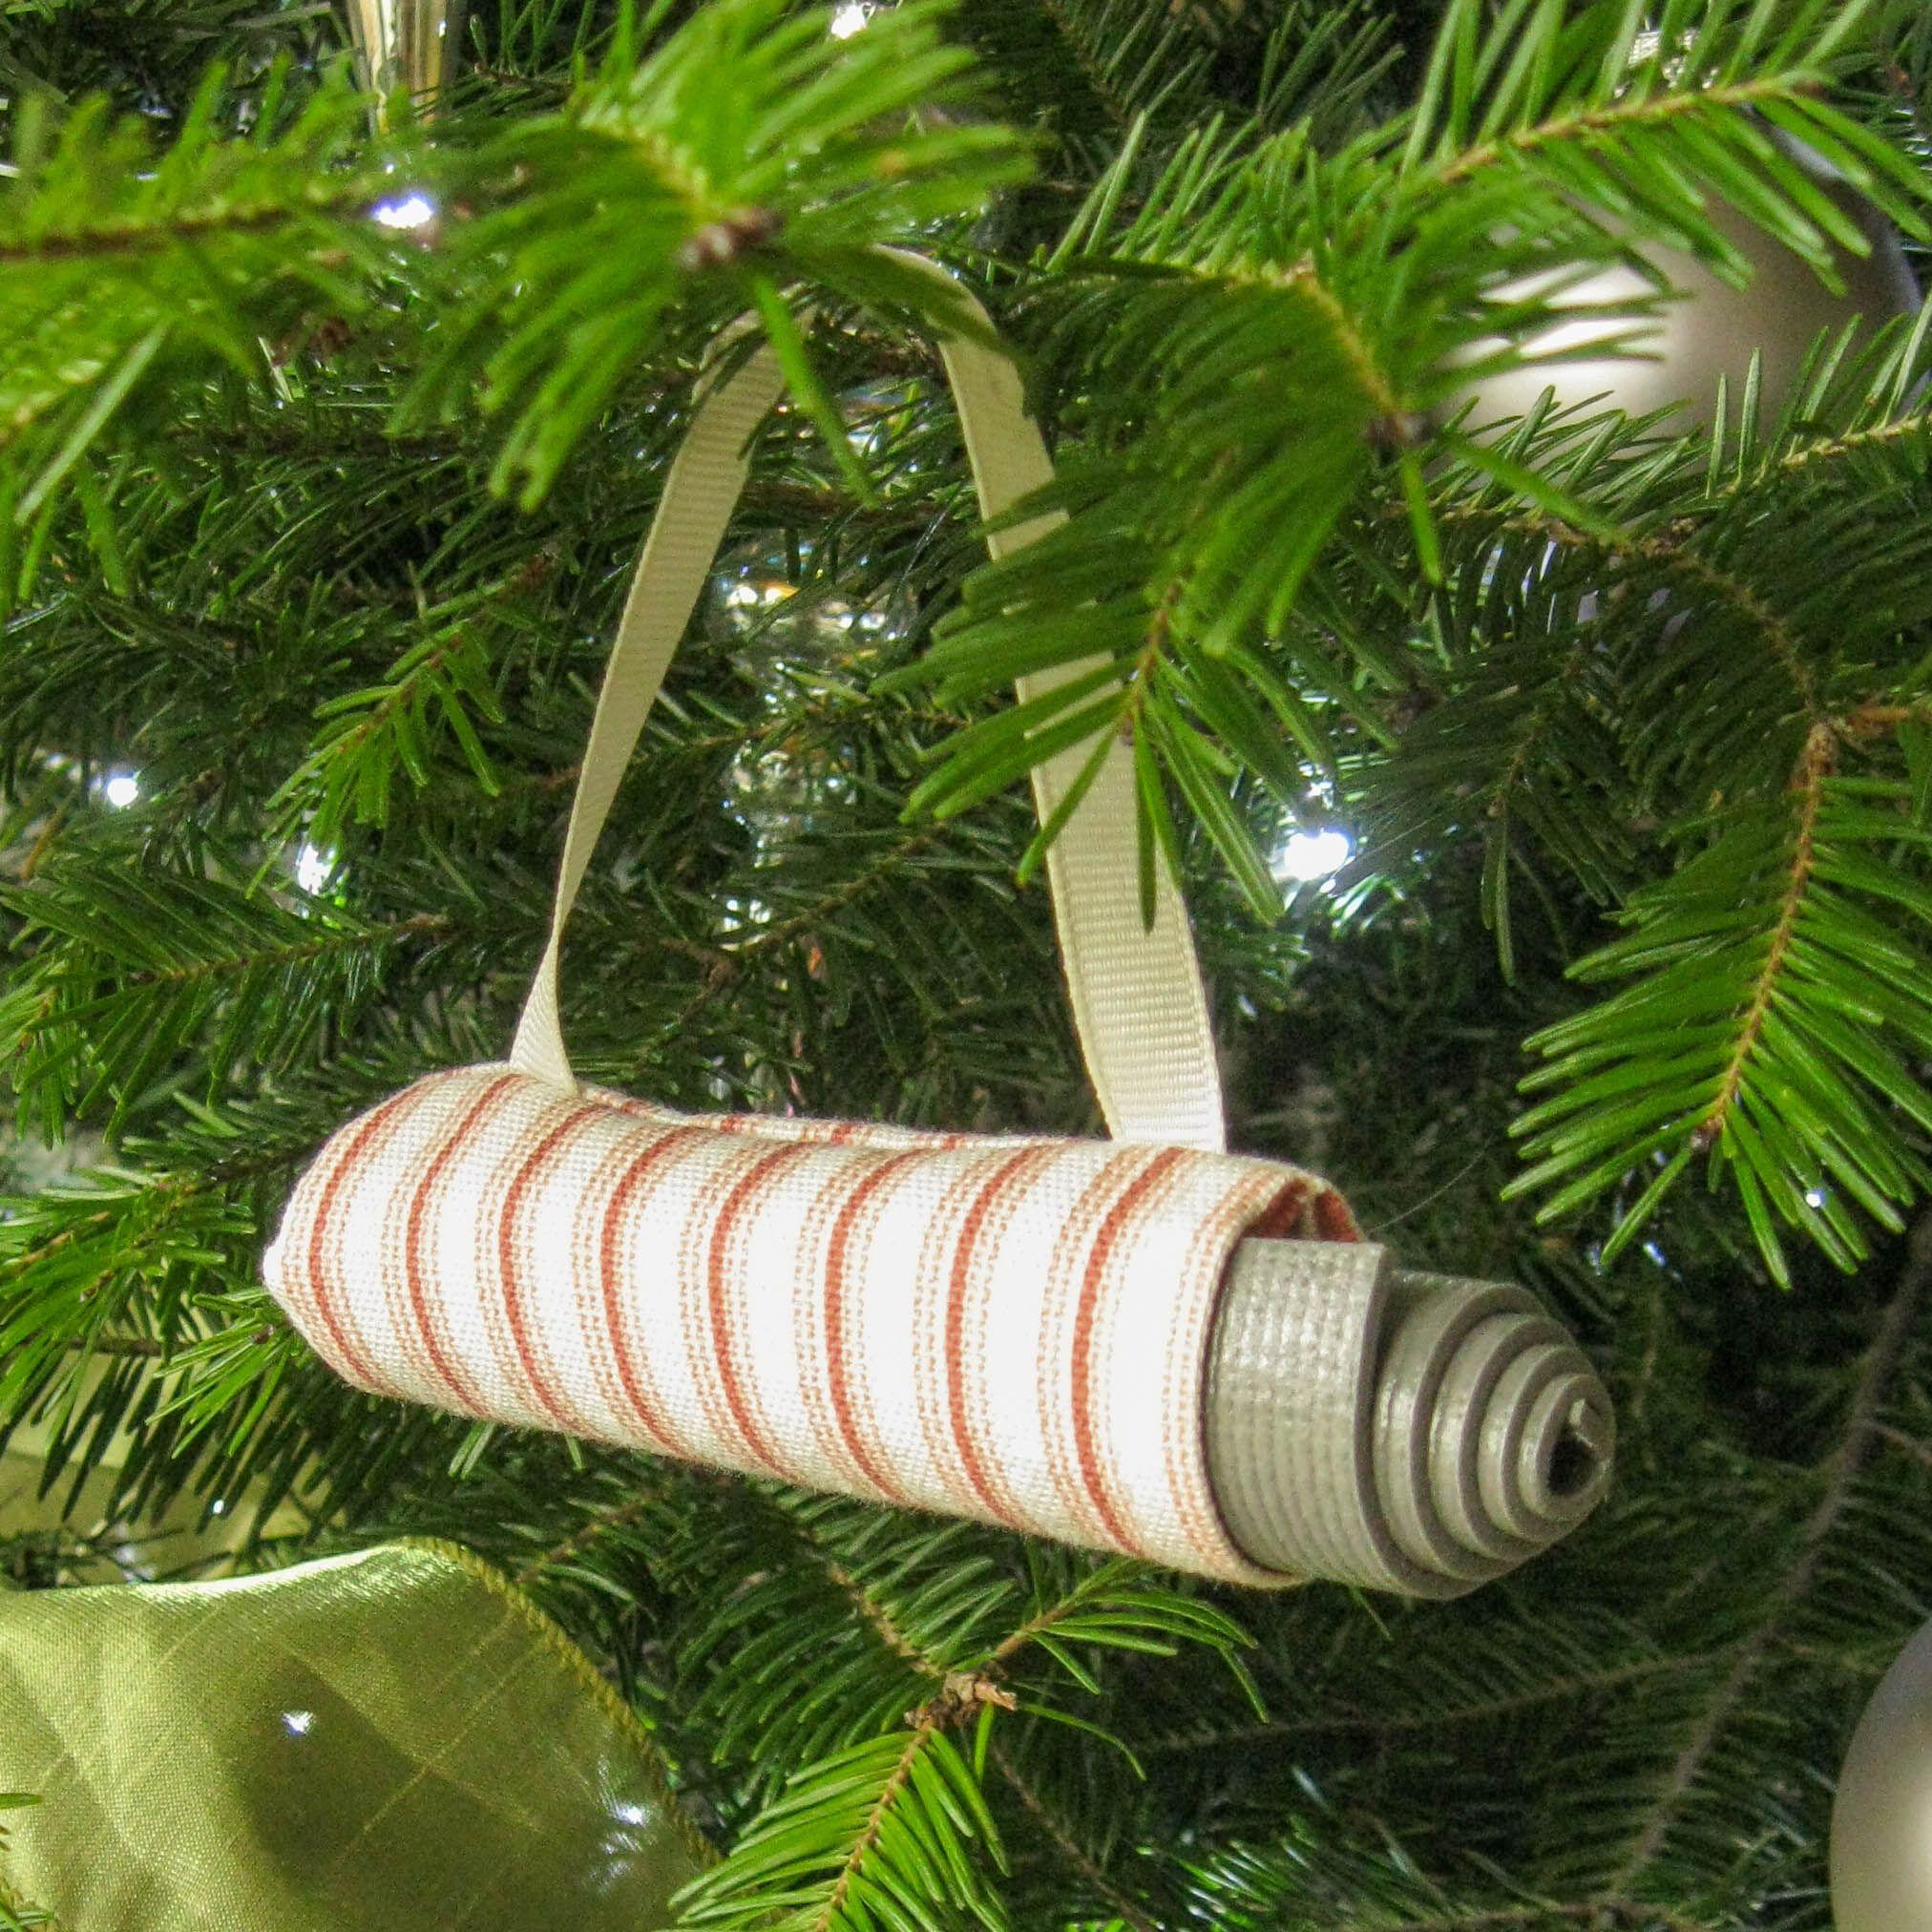 Yoga Stocking Stuffer Yoga Christmas Decoration Coral Stripe Yoga Bag Christmas Ornament Yoga Instructor Gift Secret S Handmade Ticking Stripe Artisan Gift